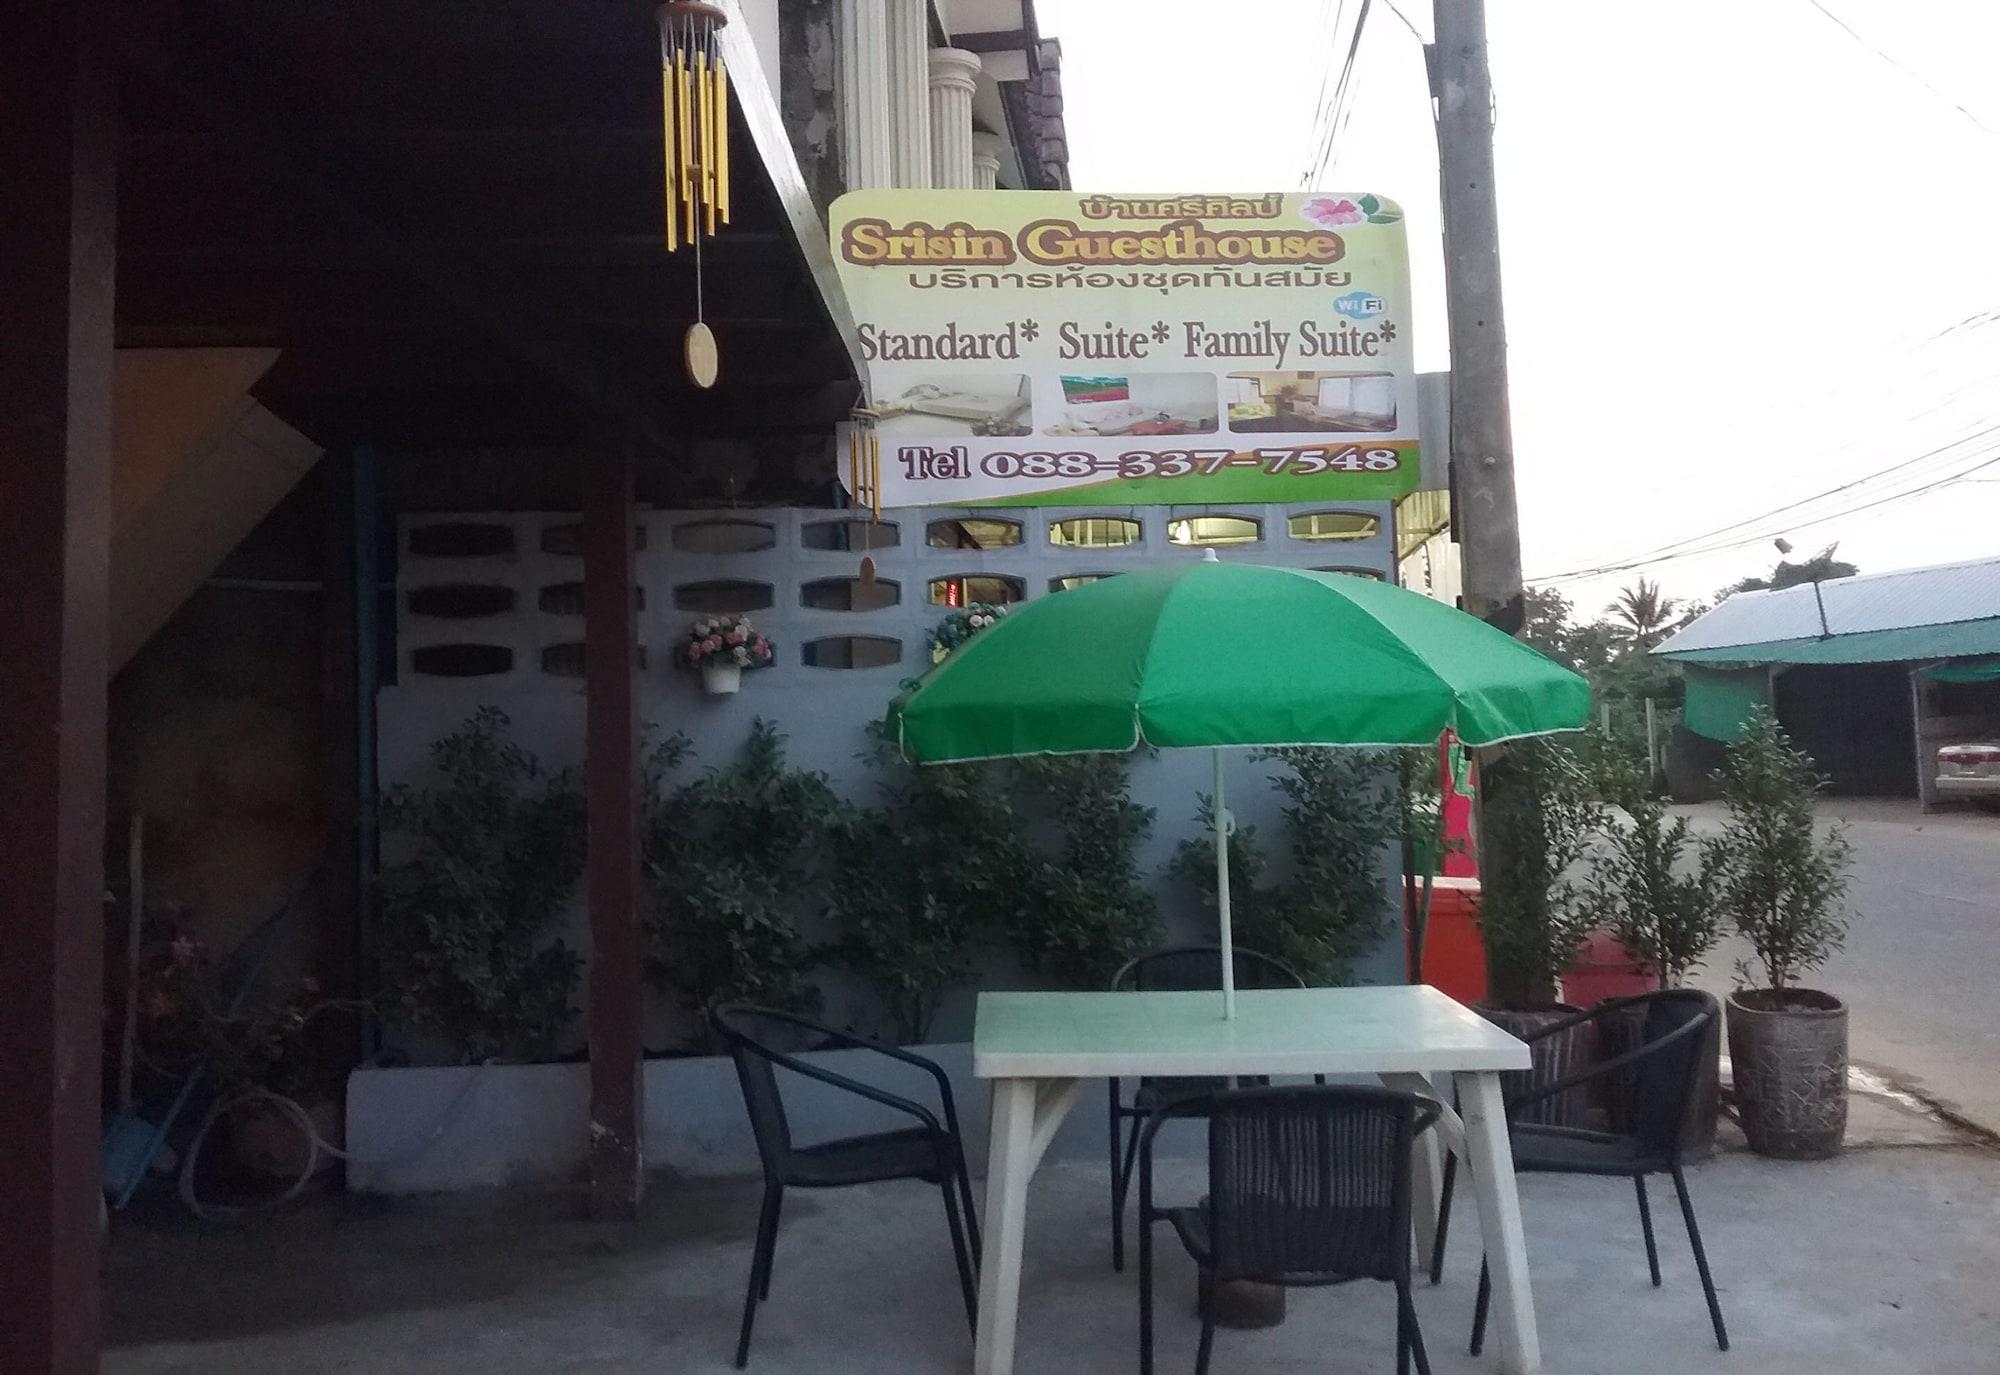 Srisin Guesthouse, Muang Udon Thani